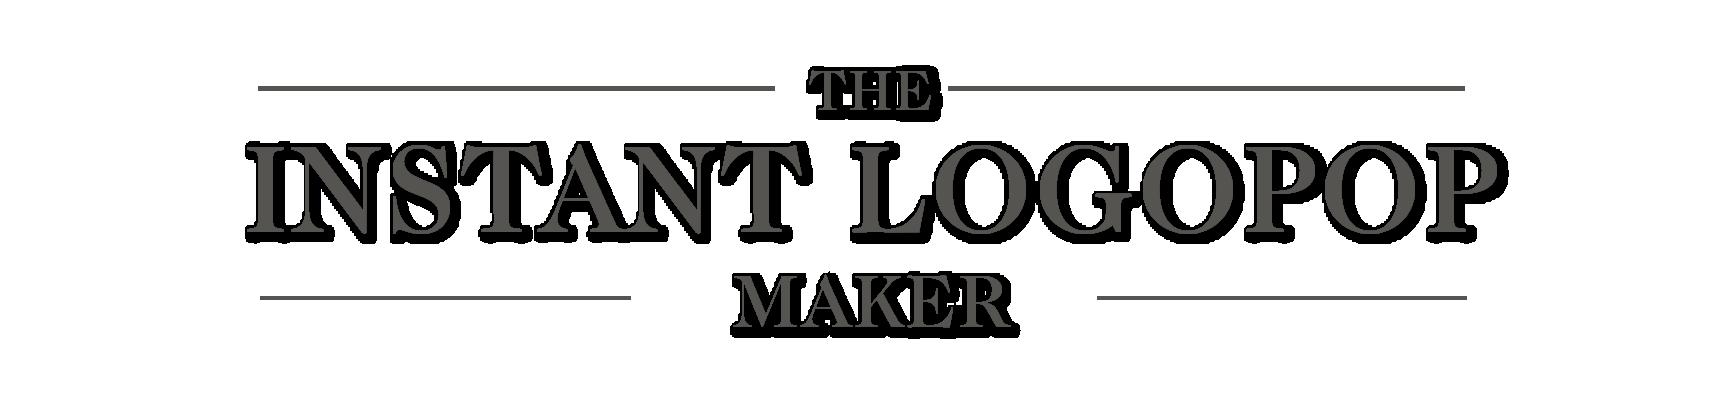 5. Logopop Title5.png